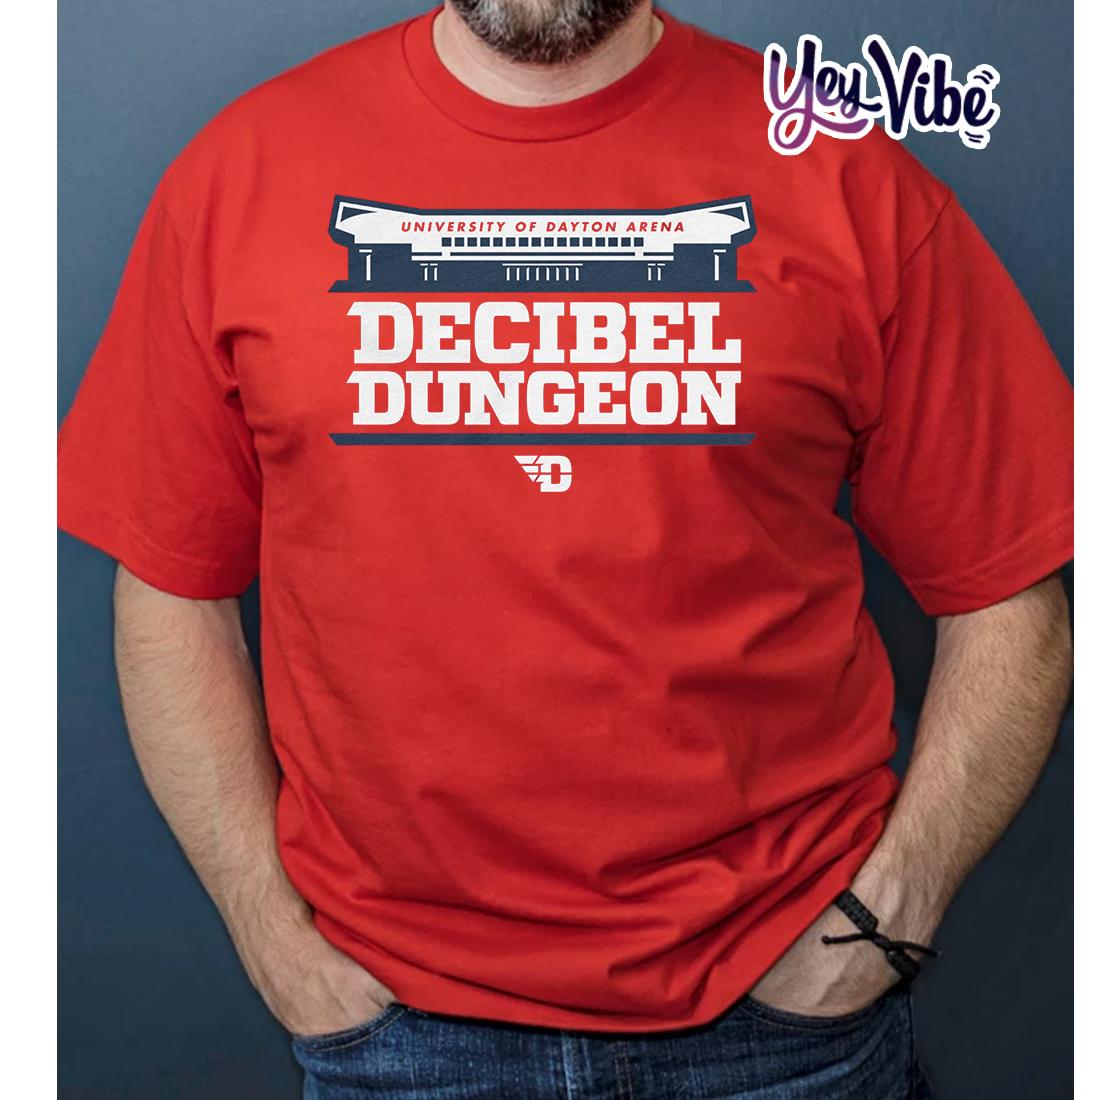 Decibel Dungeon T Shirt University Of Dayton Arena